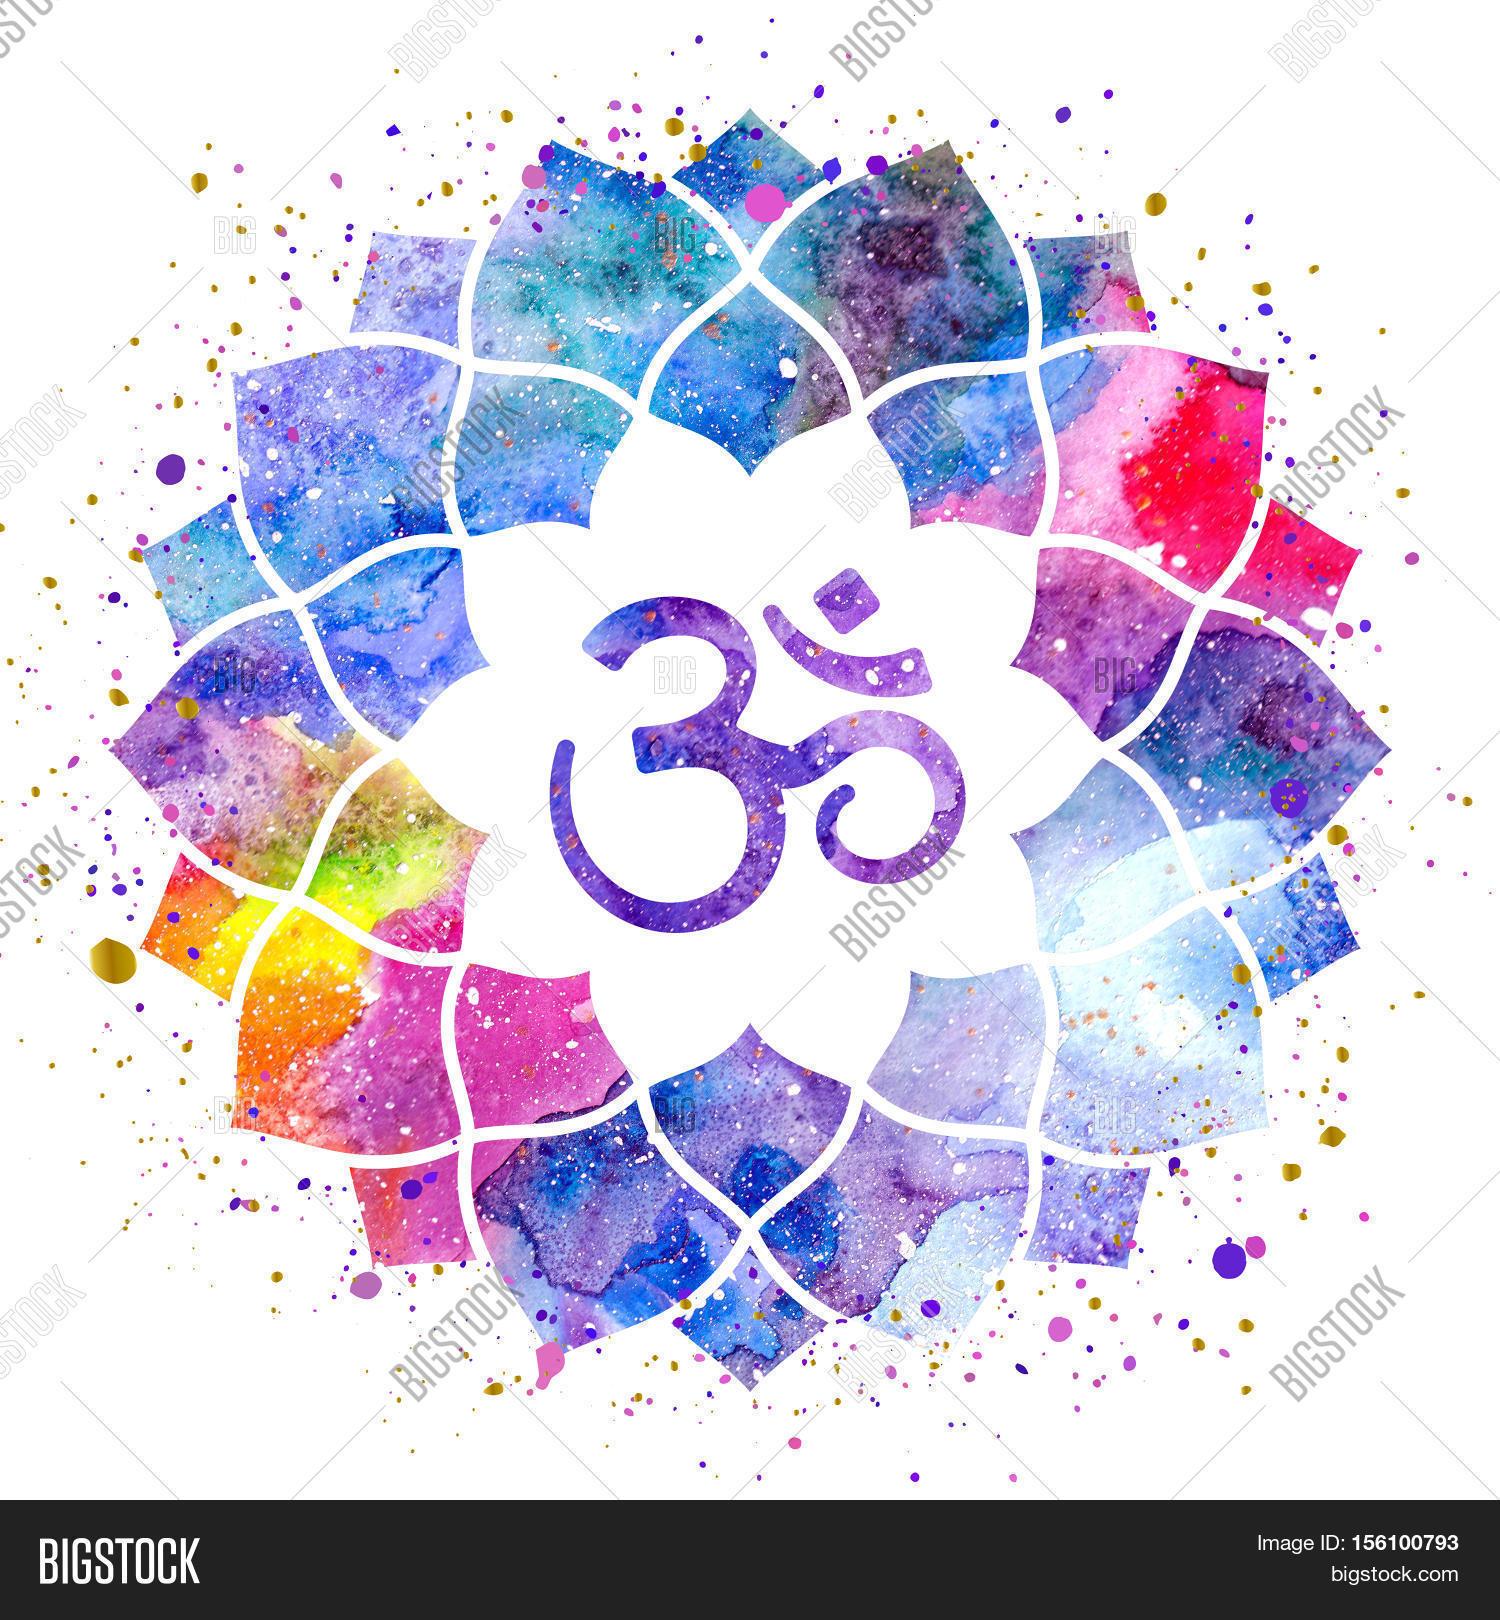 Om Sign Lotus Flower Image Photo Free Trial Bigstock